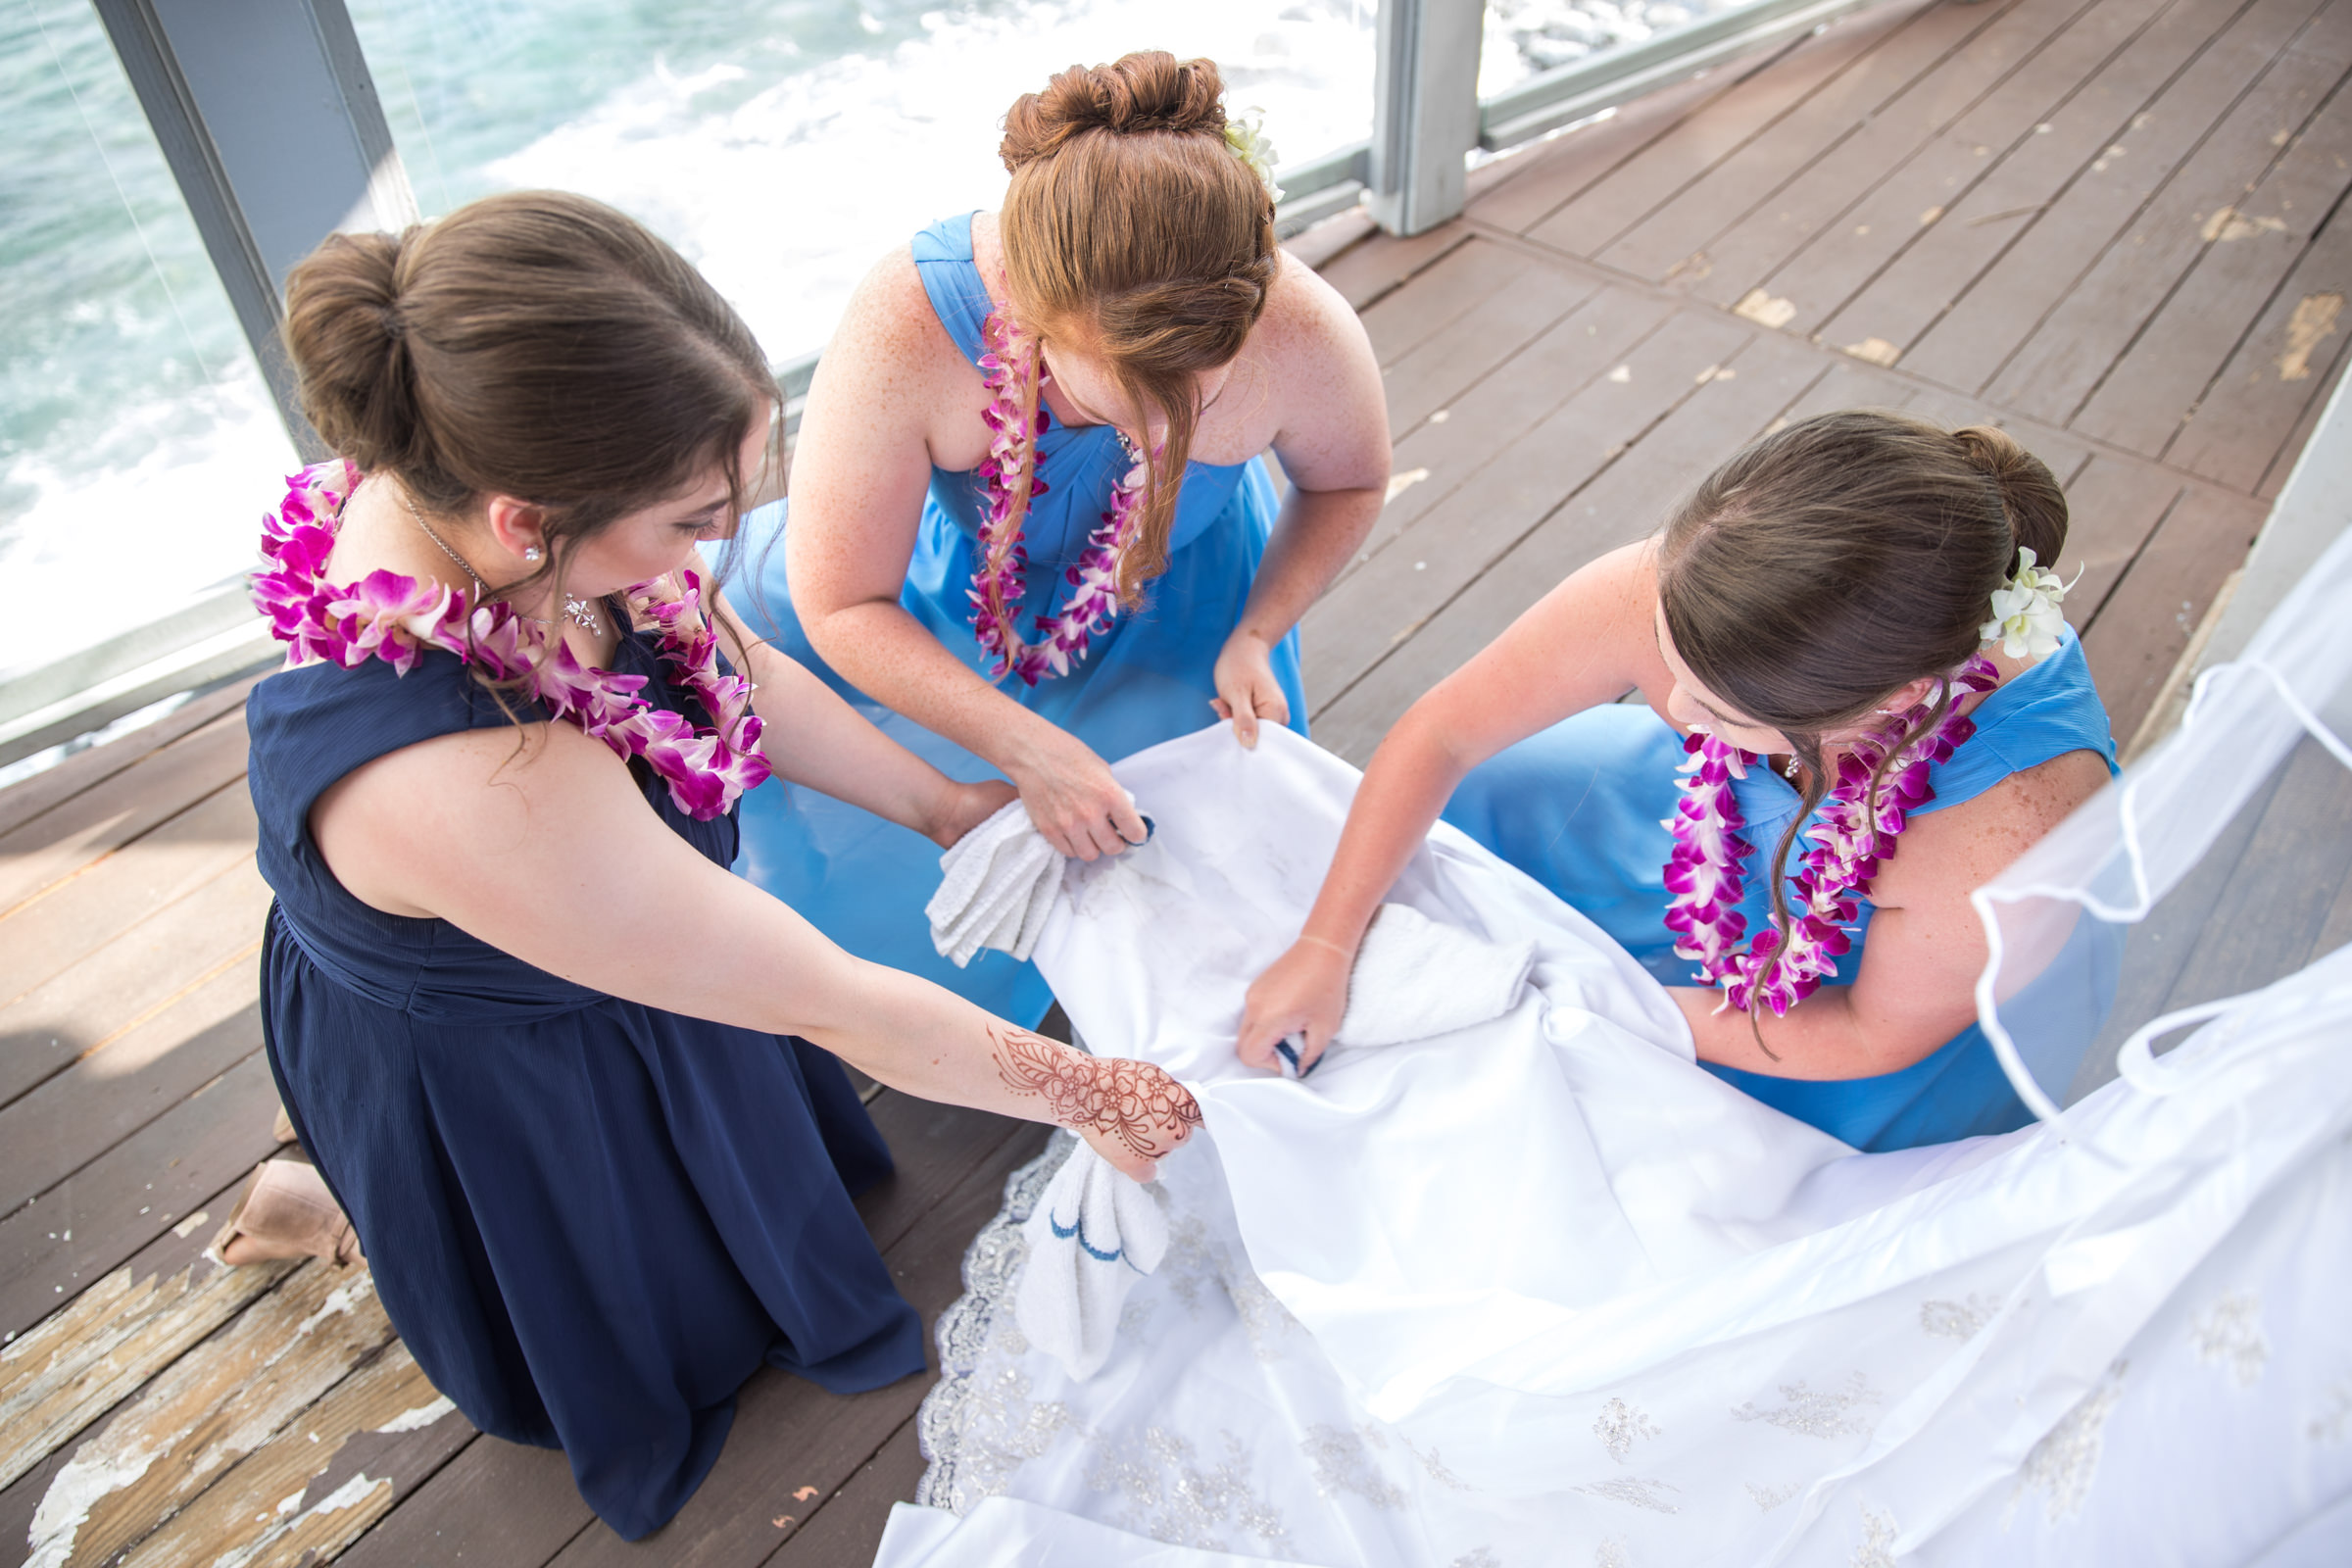 wedding-photographer-photography-destination-hawaii-lake-tahoe-getting-ready-bridesmaids